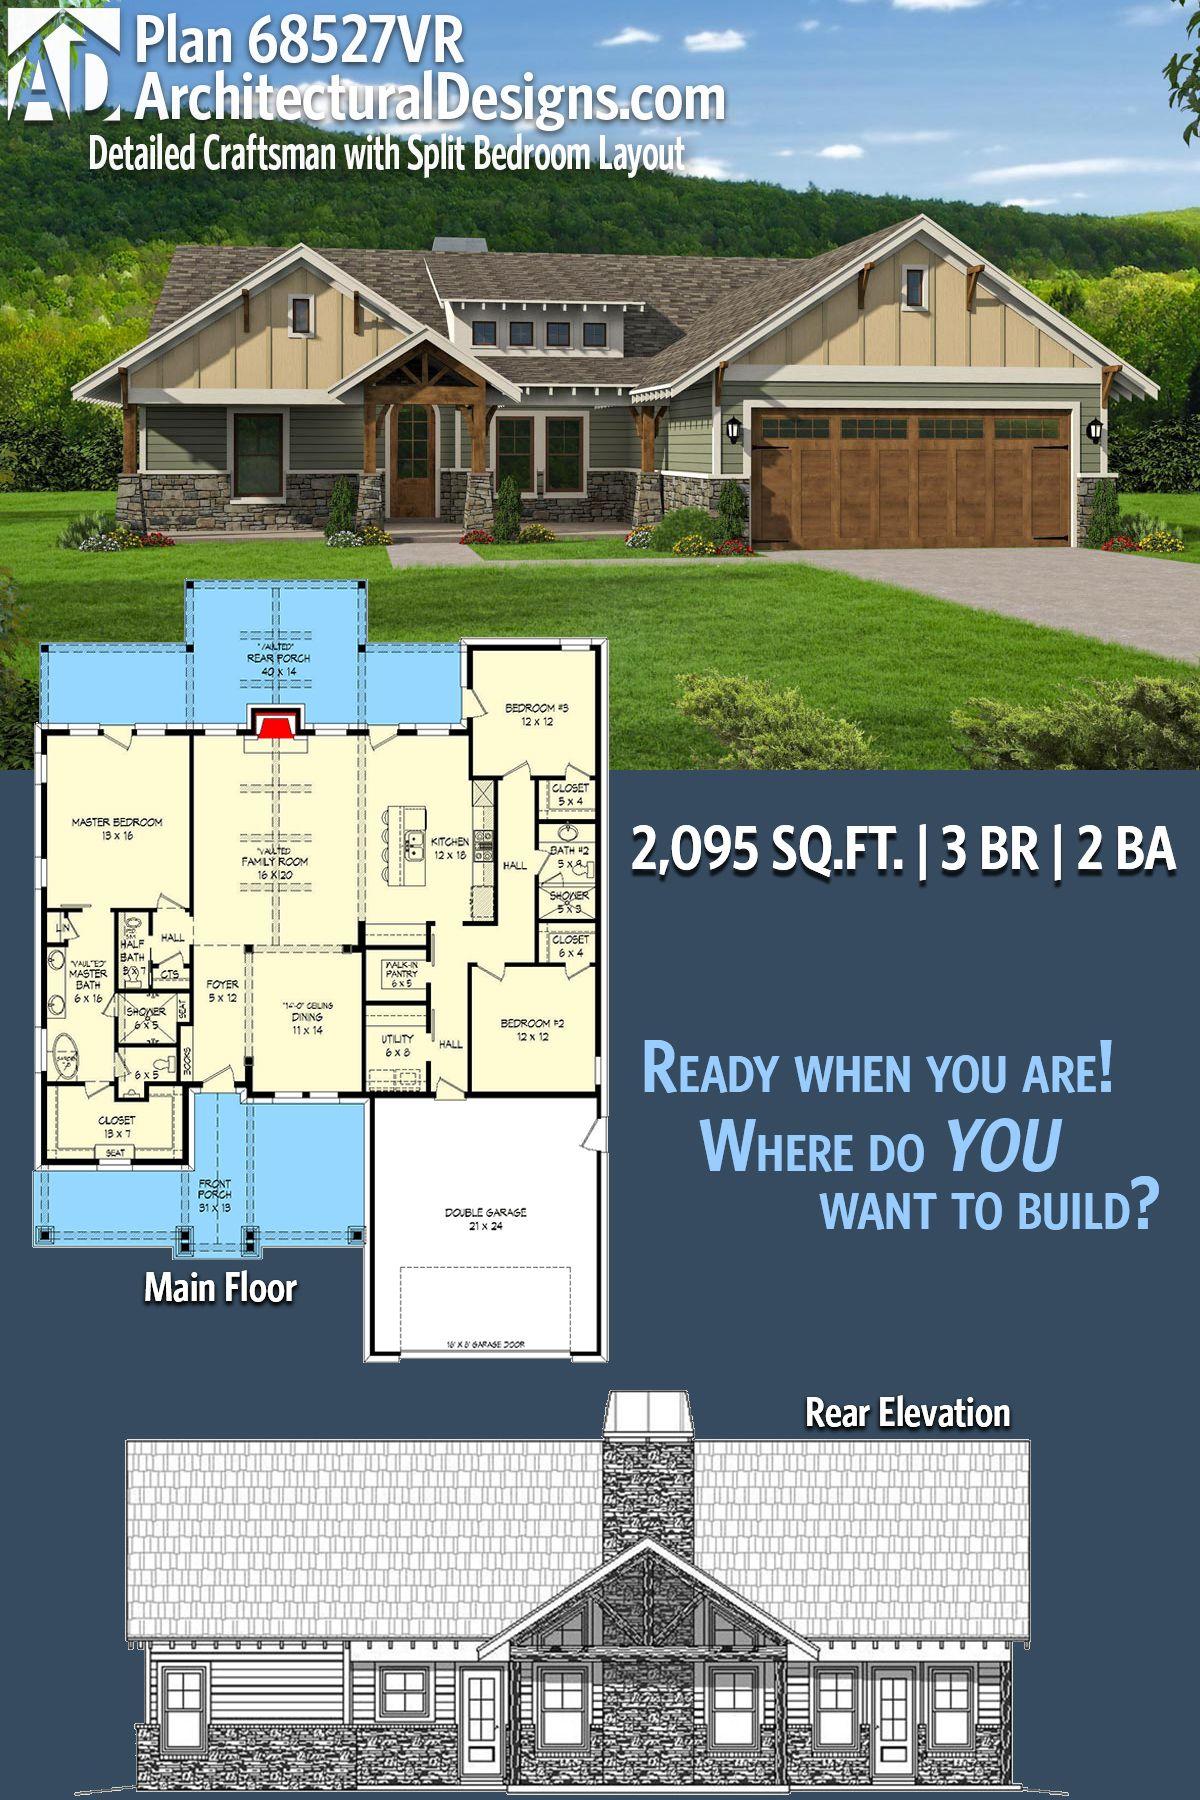 architectural designs craftsman house plan 68527vr has 3 split-beds